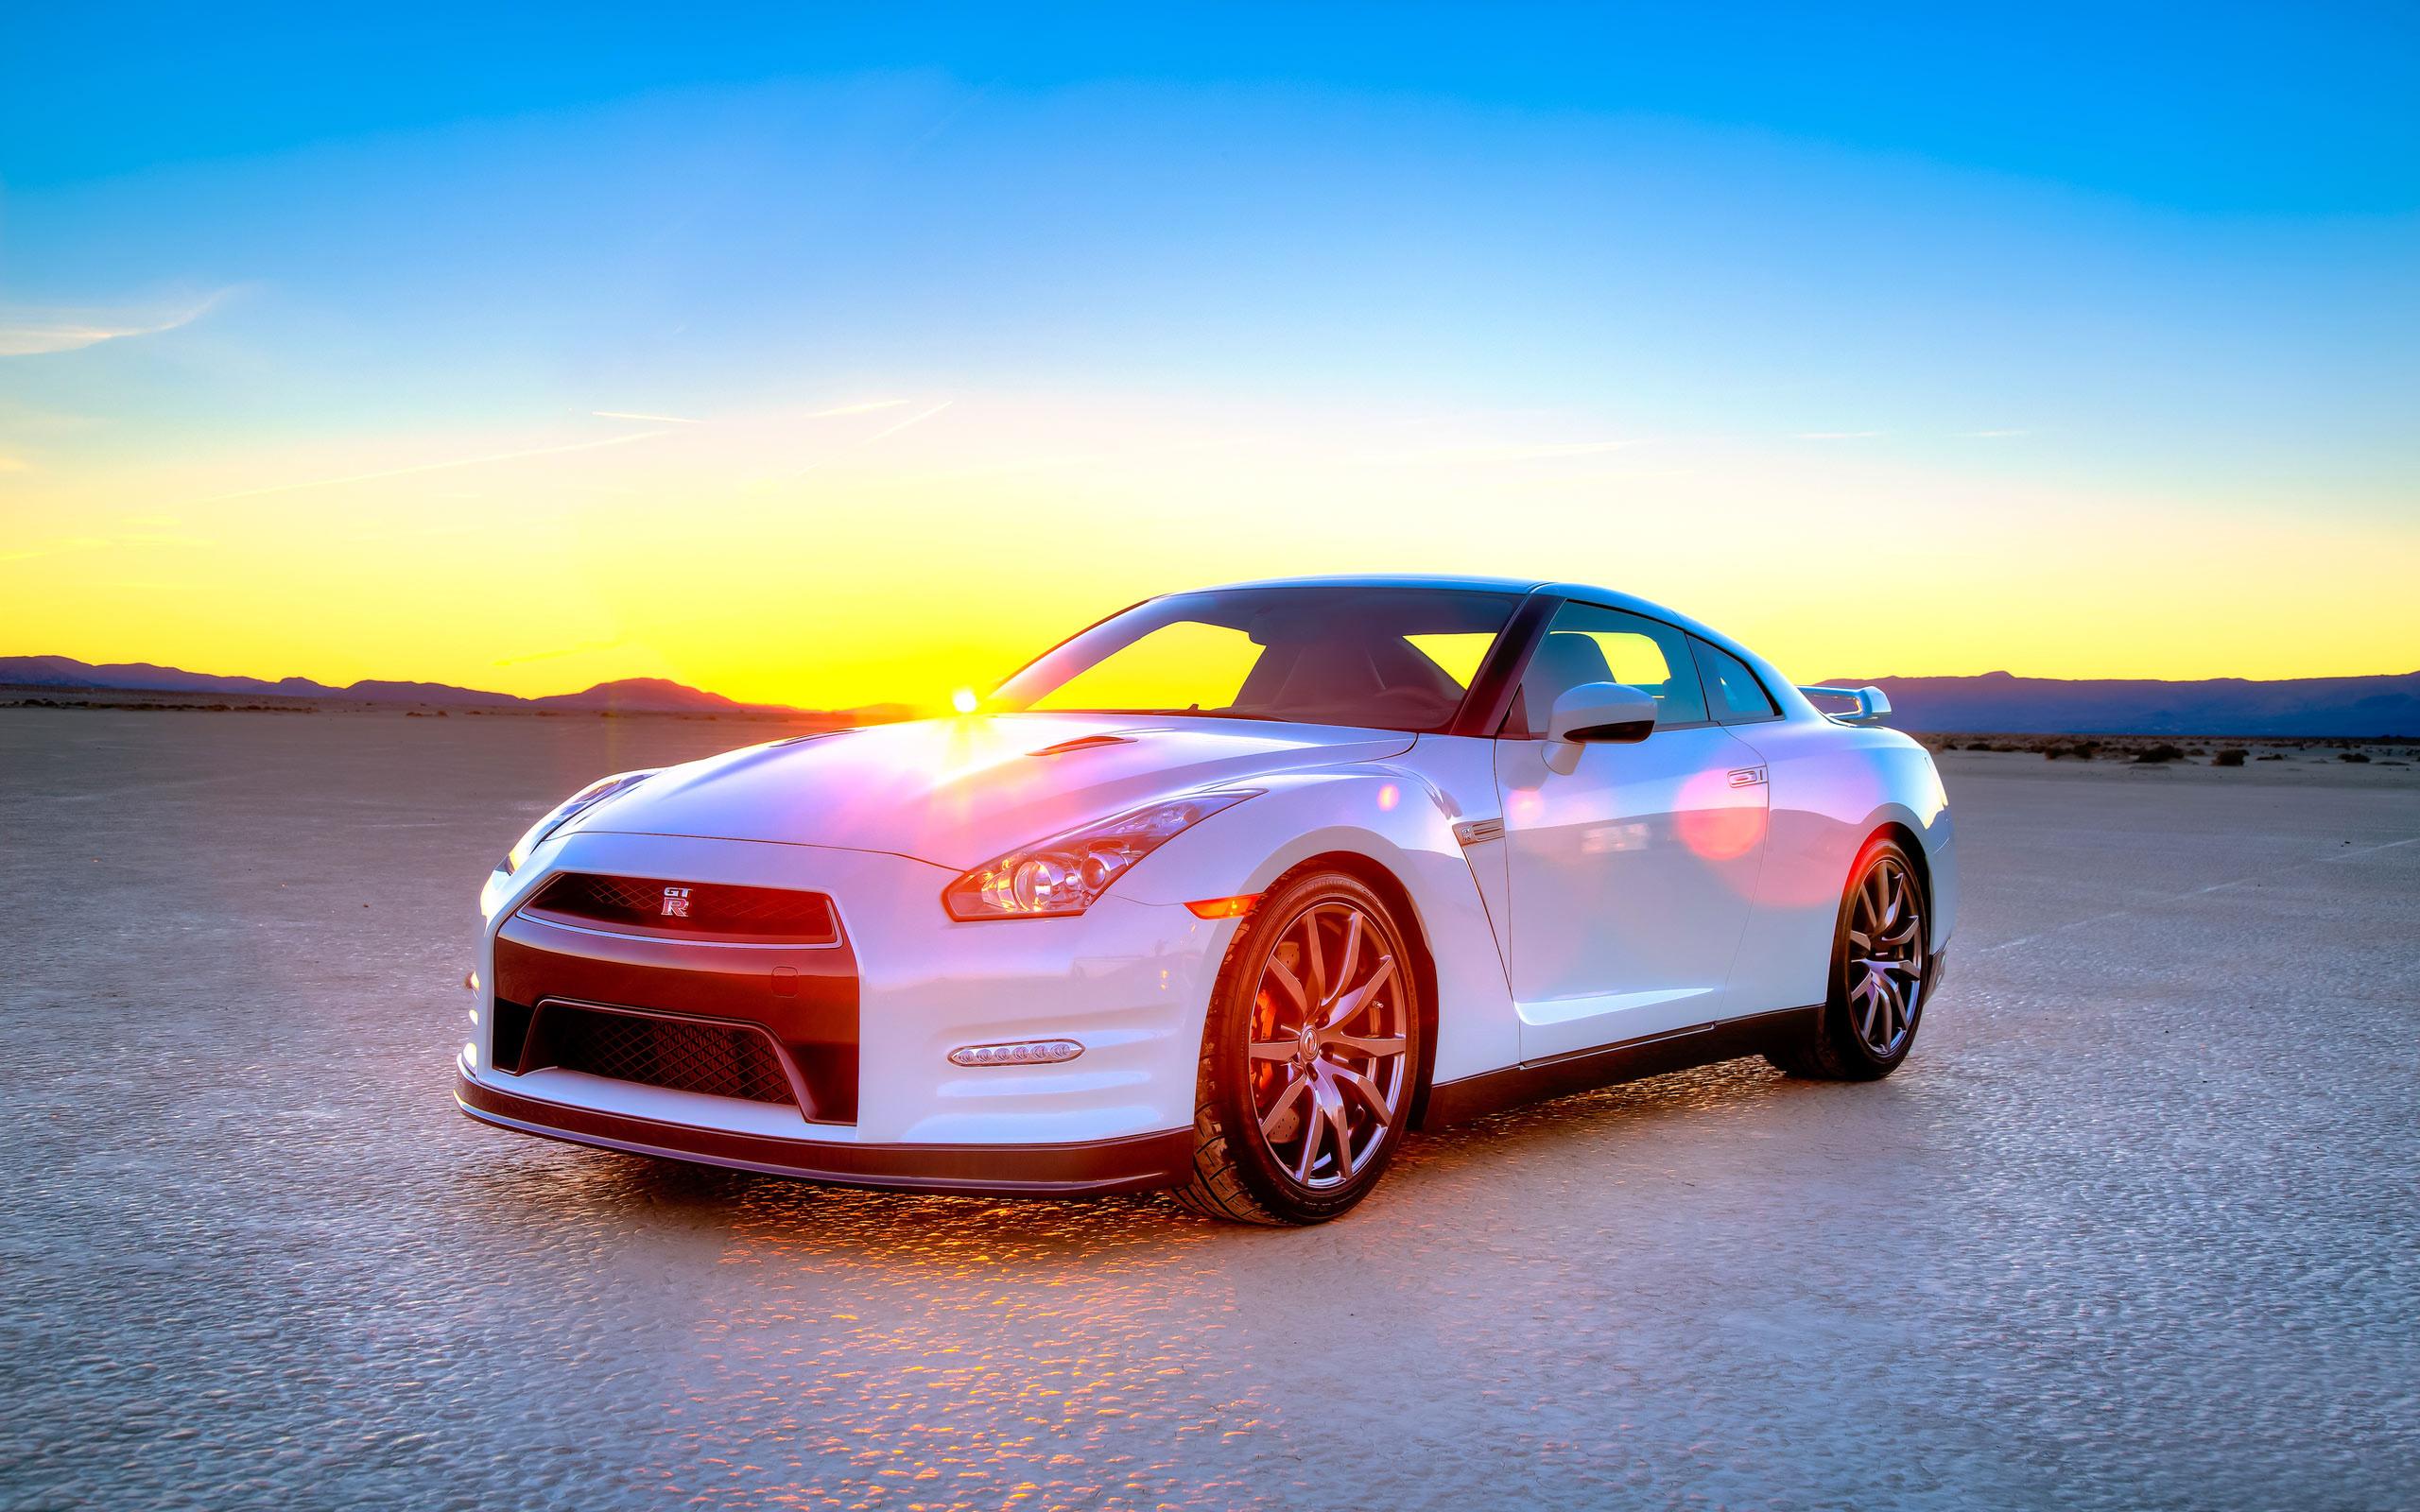 2014 Nissan GT R Wallpaper HD Car Wallpapers 2560x1600